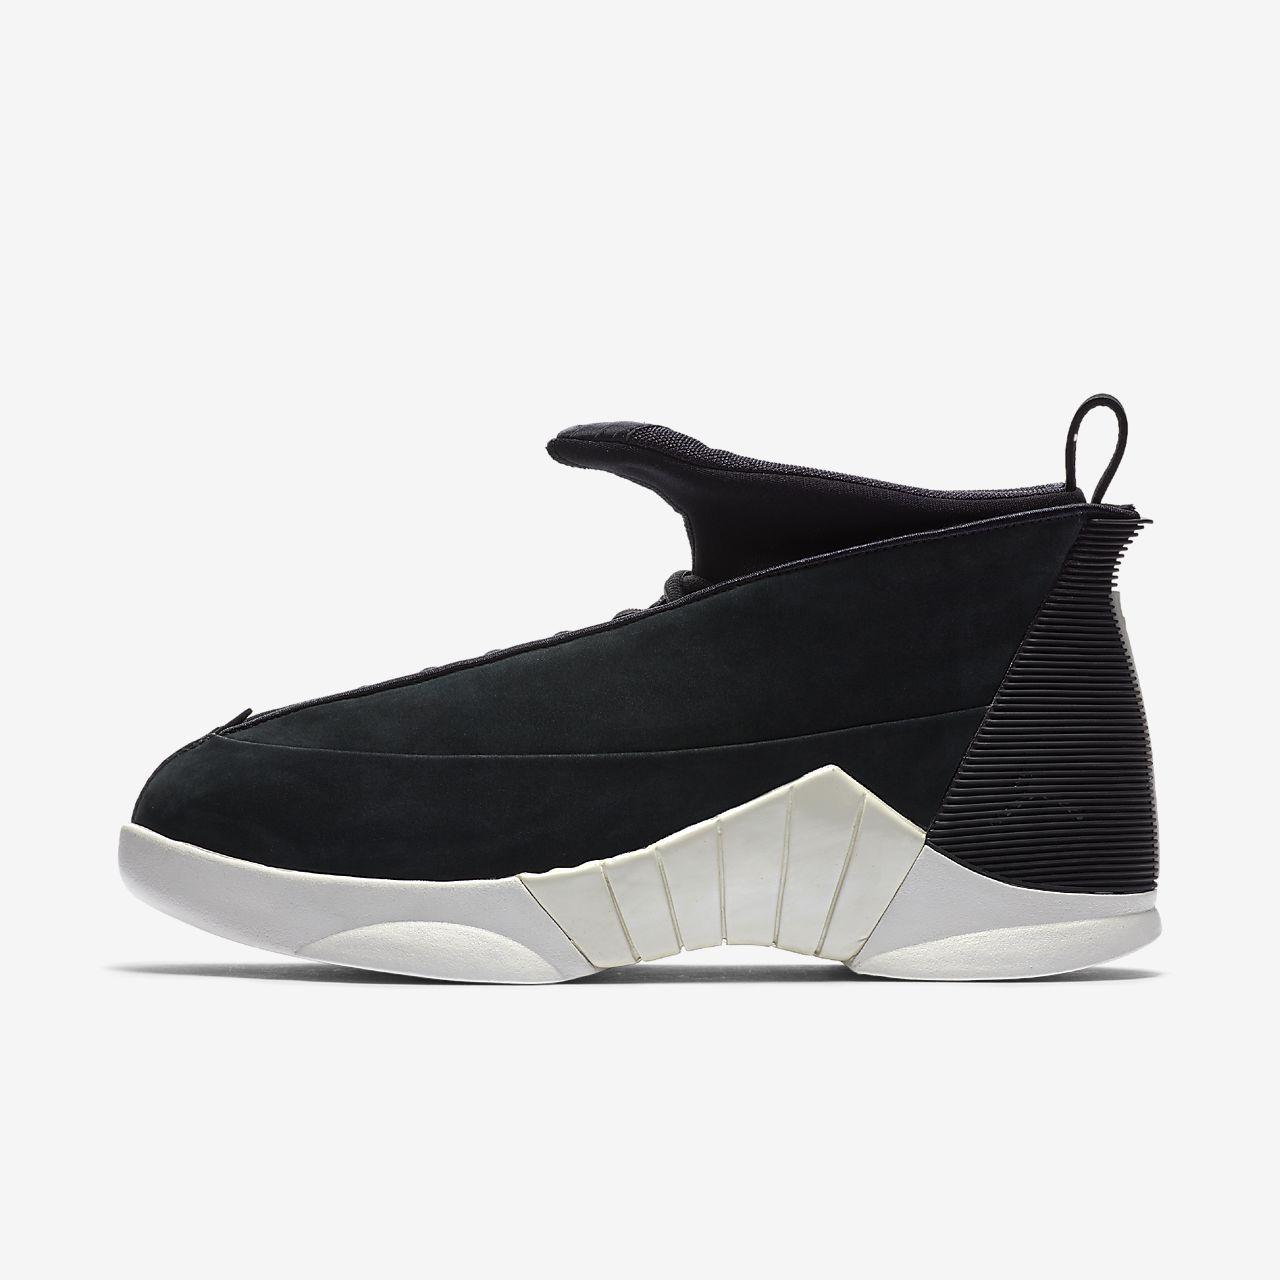 875c5d5fdce5 Air Jordan 15 Retro x PSNY Men s Shoe. Nike.com CA